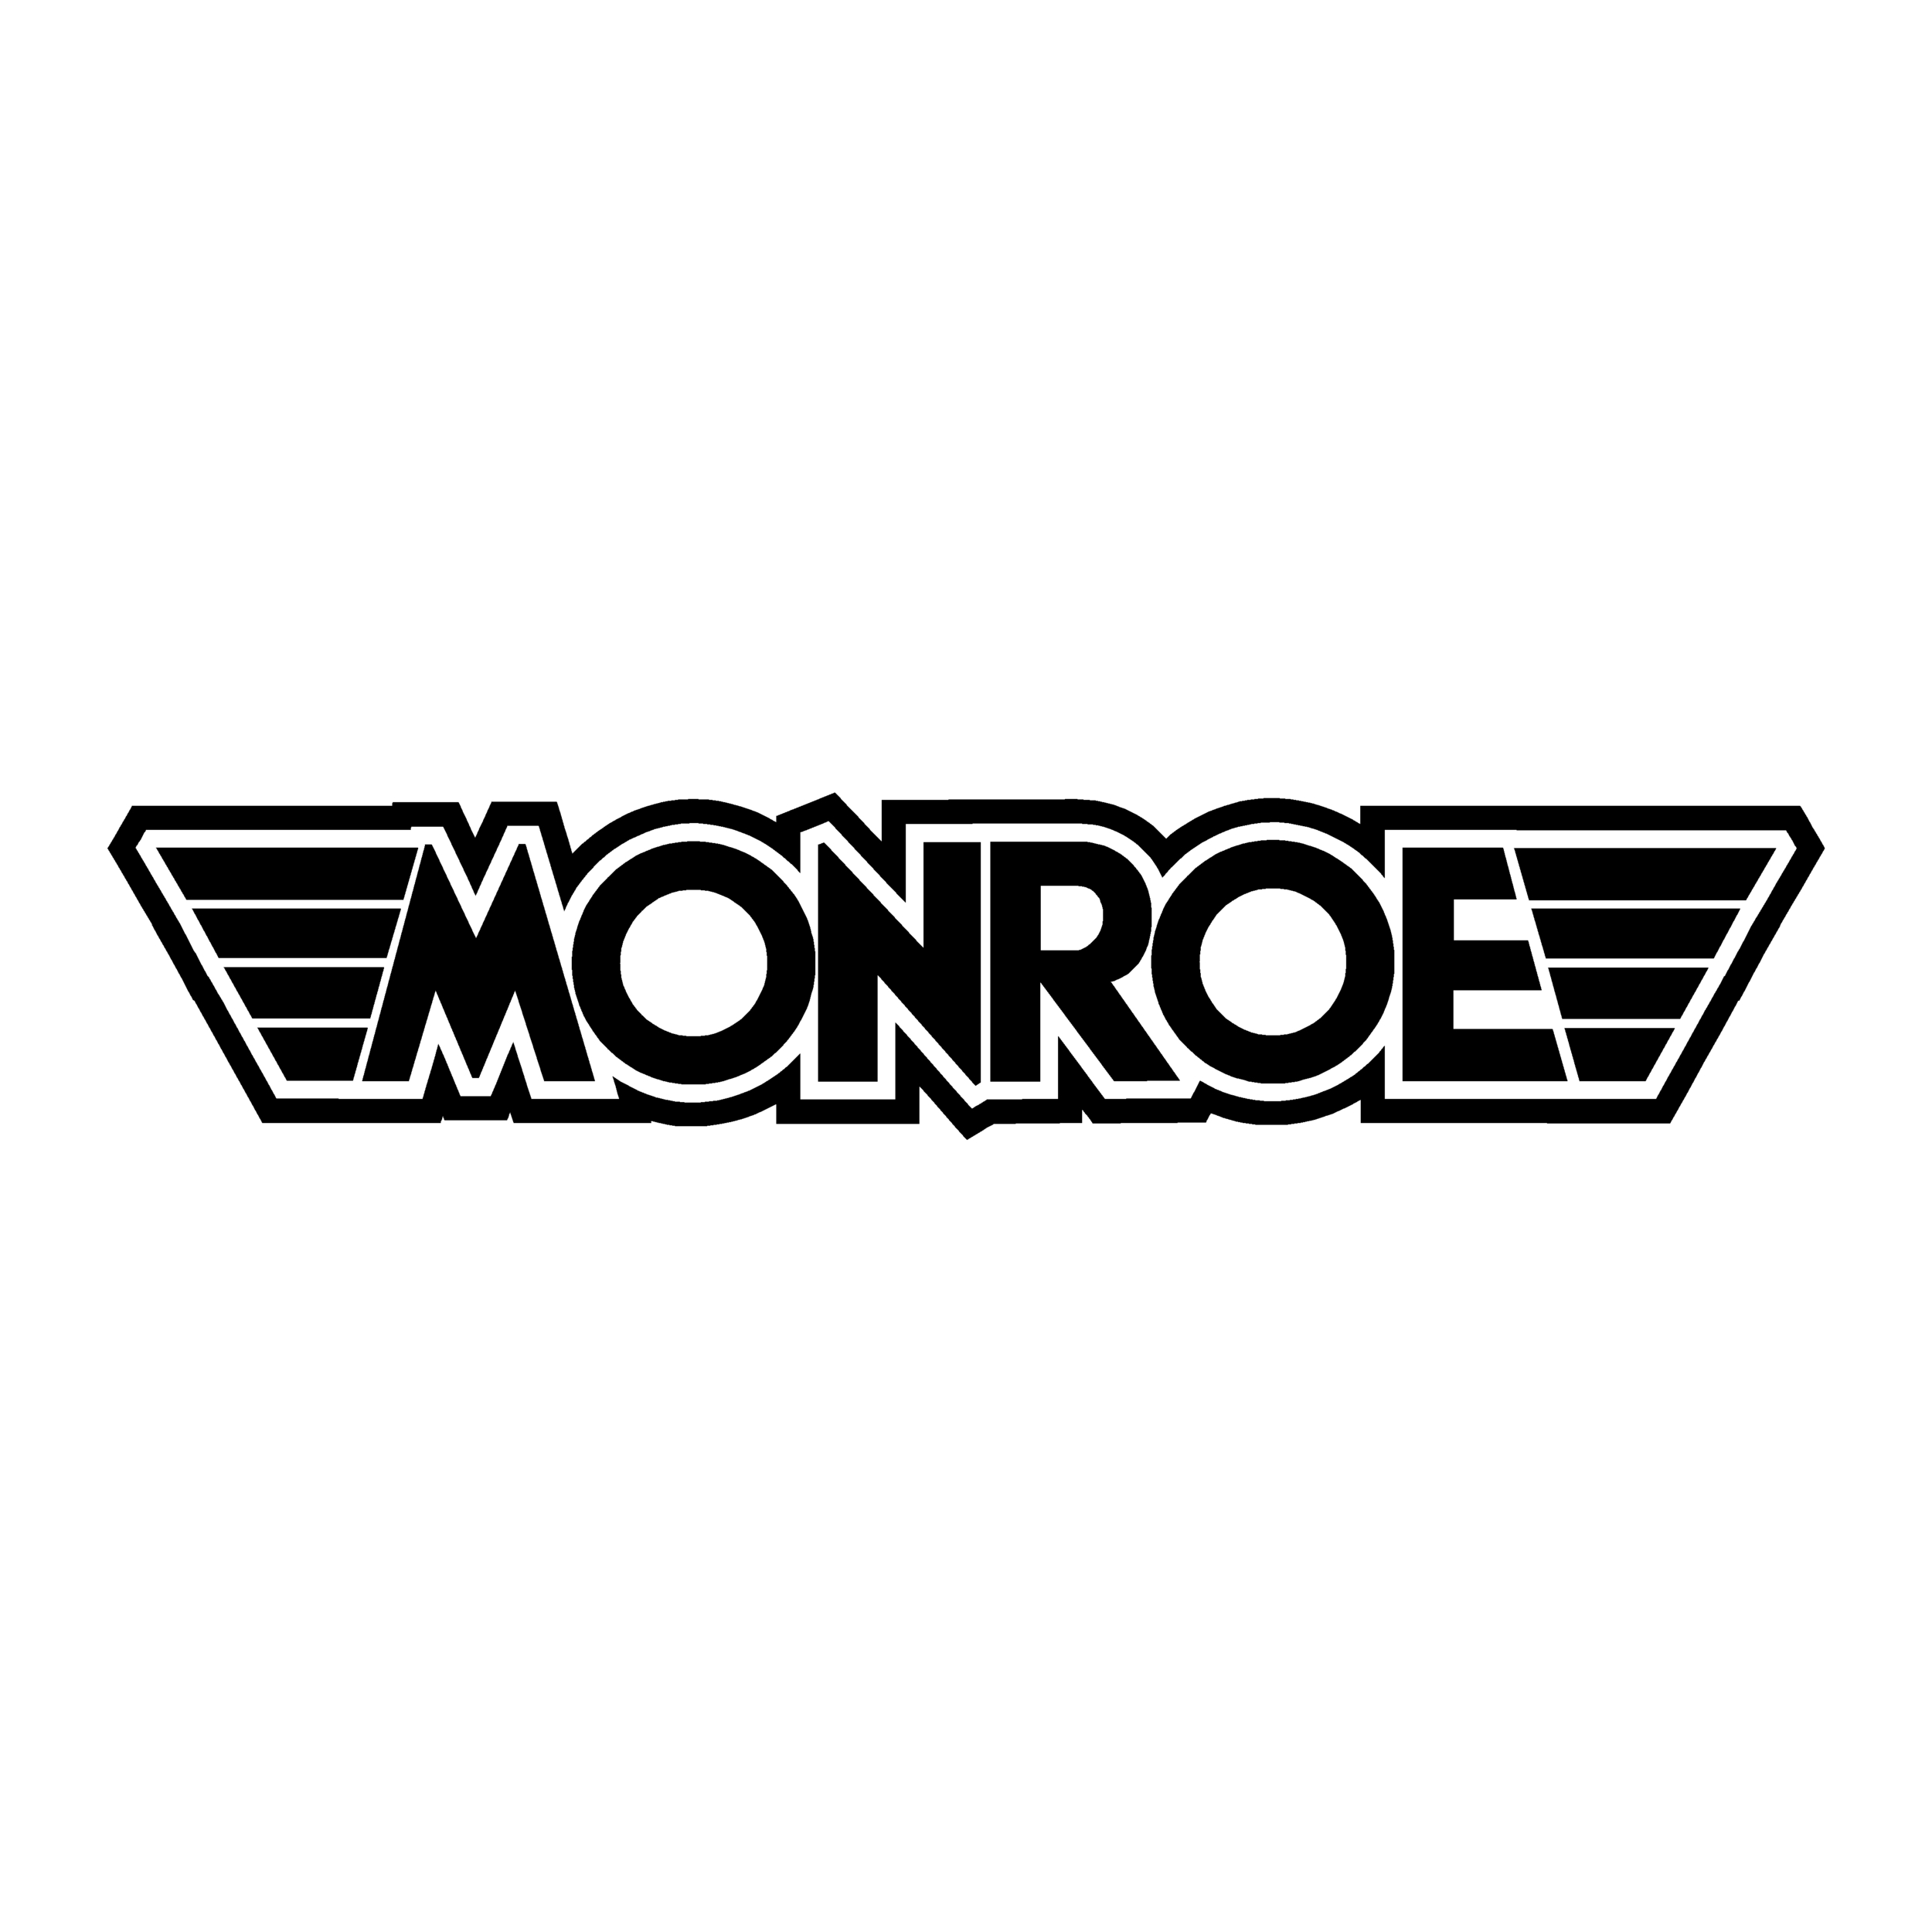 sticker monroe ref 2 tuning audio sonorisation car auto moto camion competition deco rallye autocollant